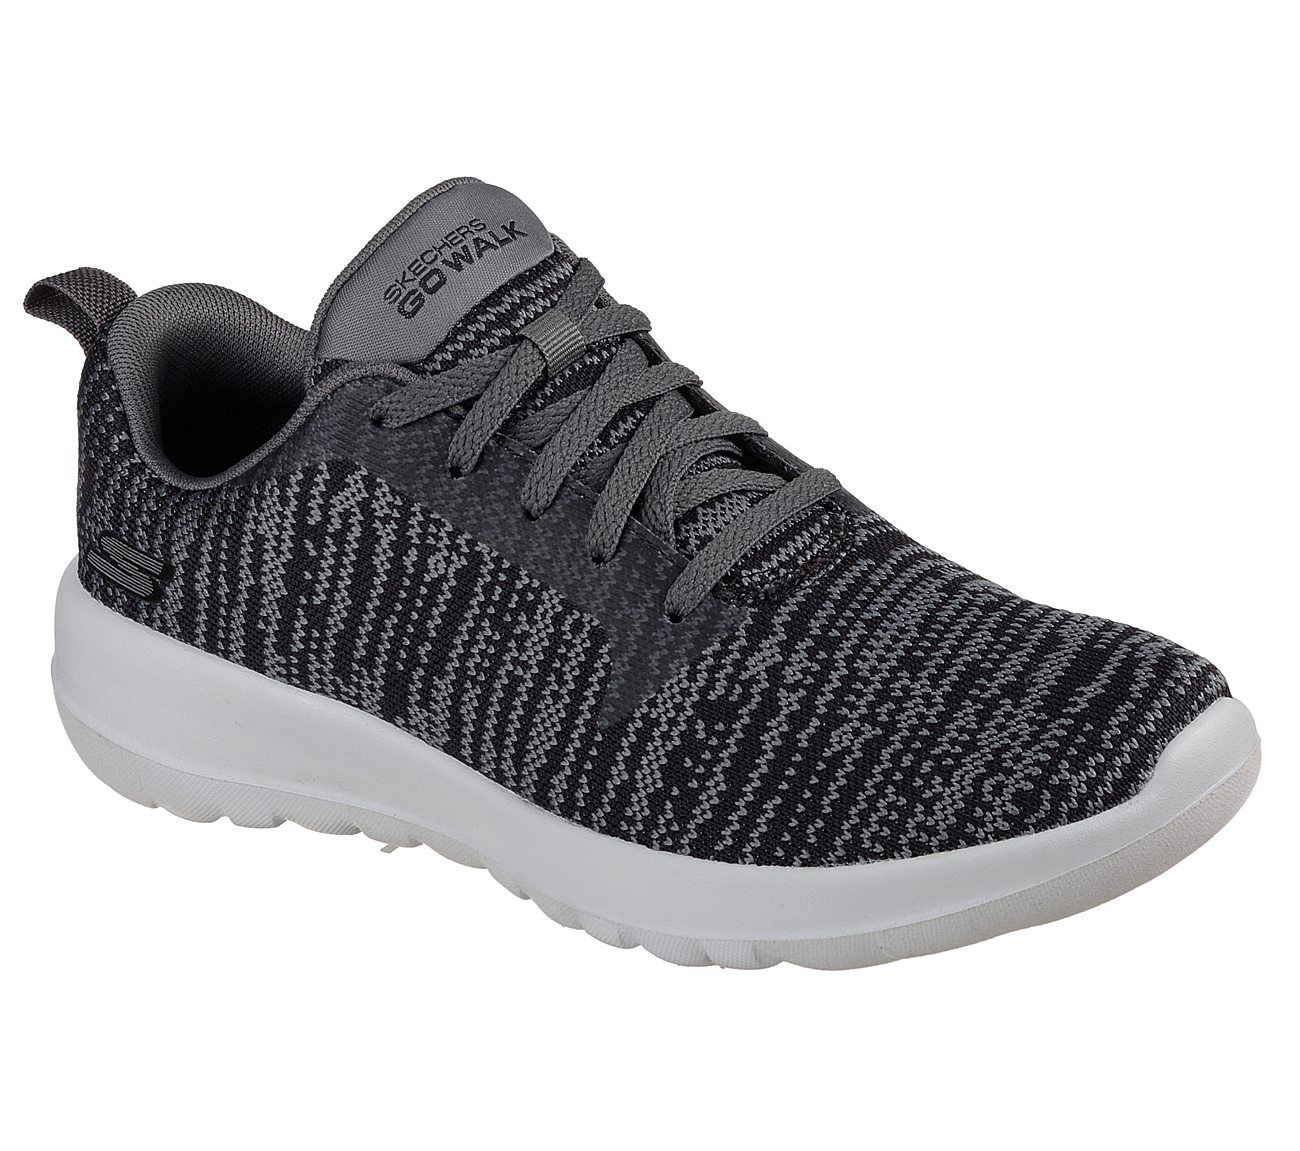 Performance Womens Go Joy 15603 Walking Shoe,Black/White,7.5 M US Skechers